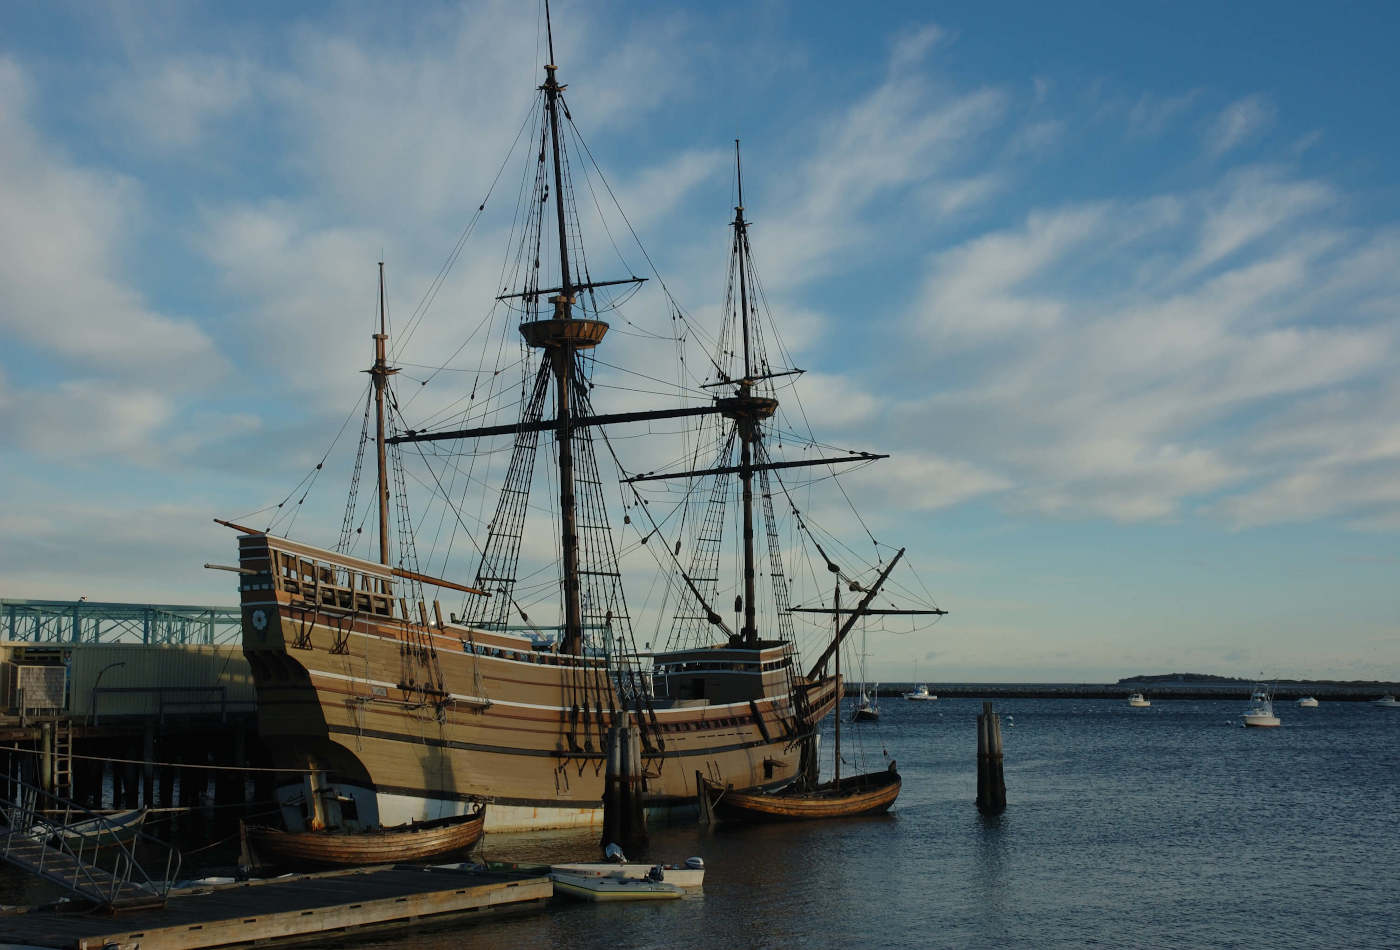 Mayflower replica ship in Plymouth, MA